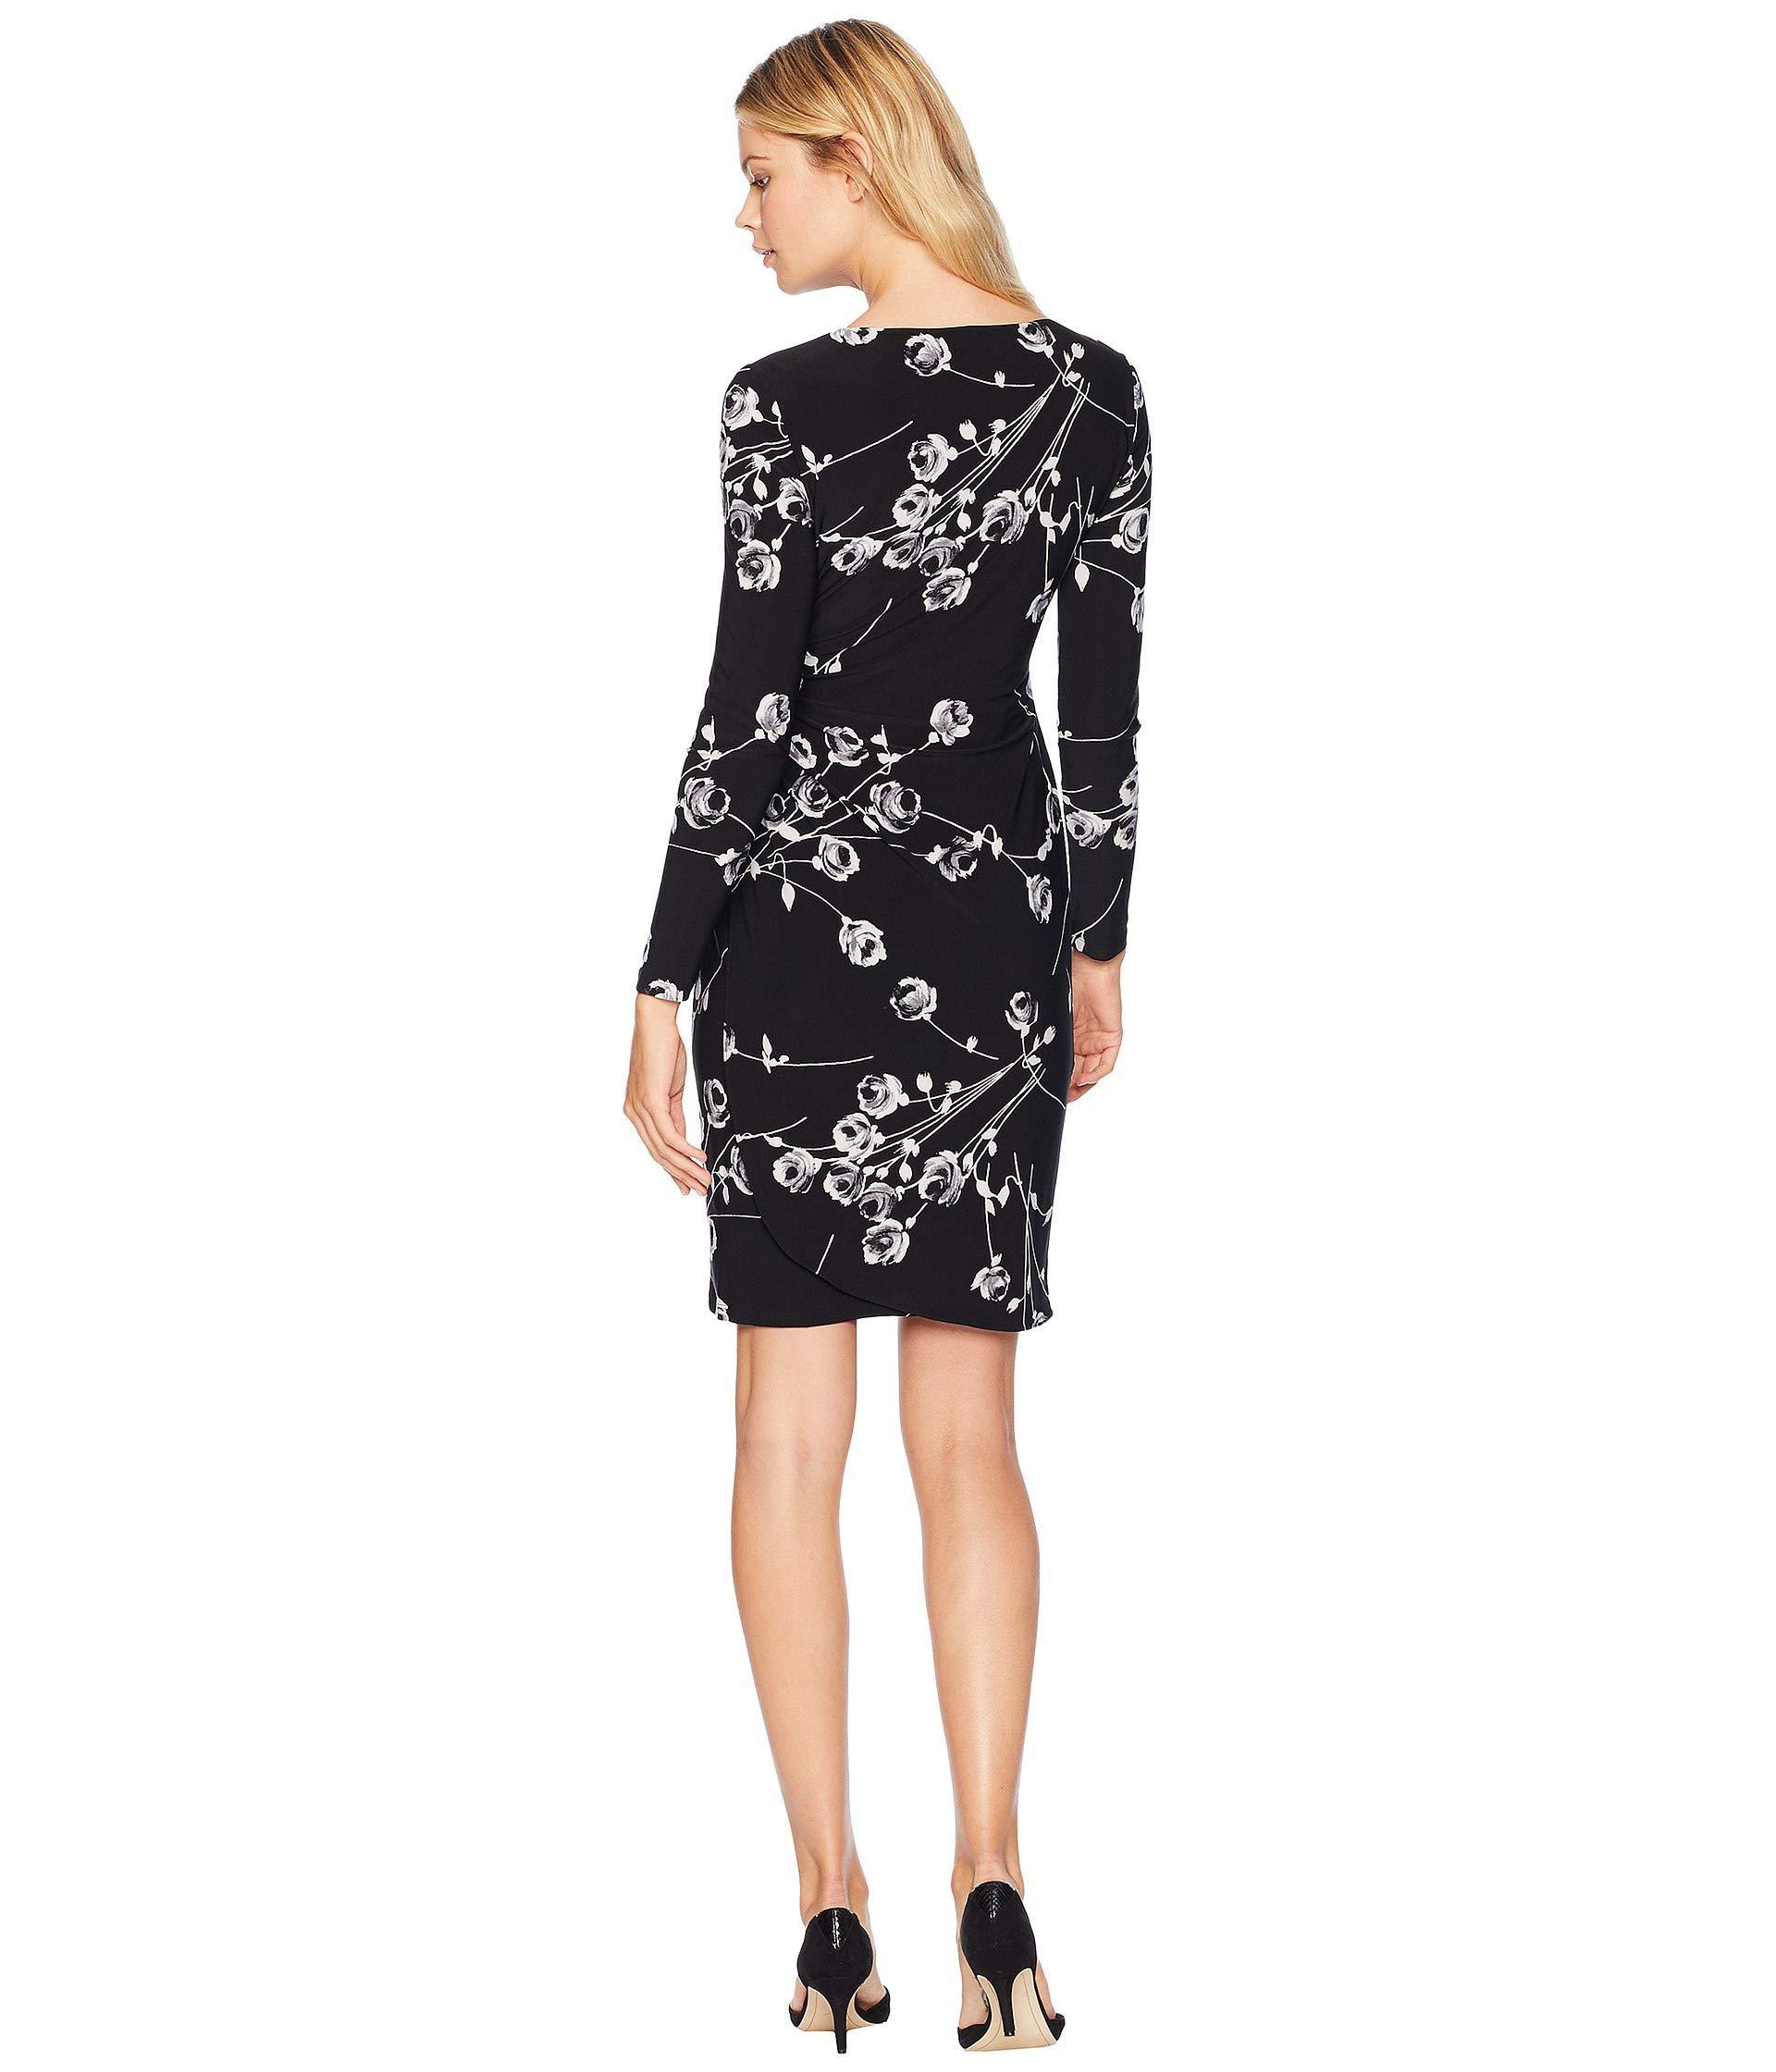 7d584fc33e007 Lauren by Ralph Lauren - Galespie Floral Kellyn Long Sleeve Day Dress (black /grey. View fullscreen